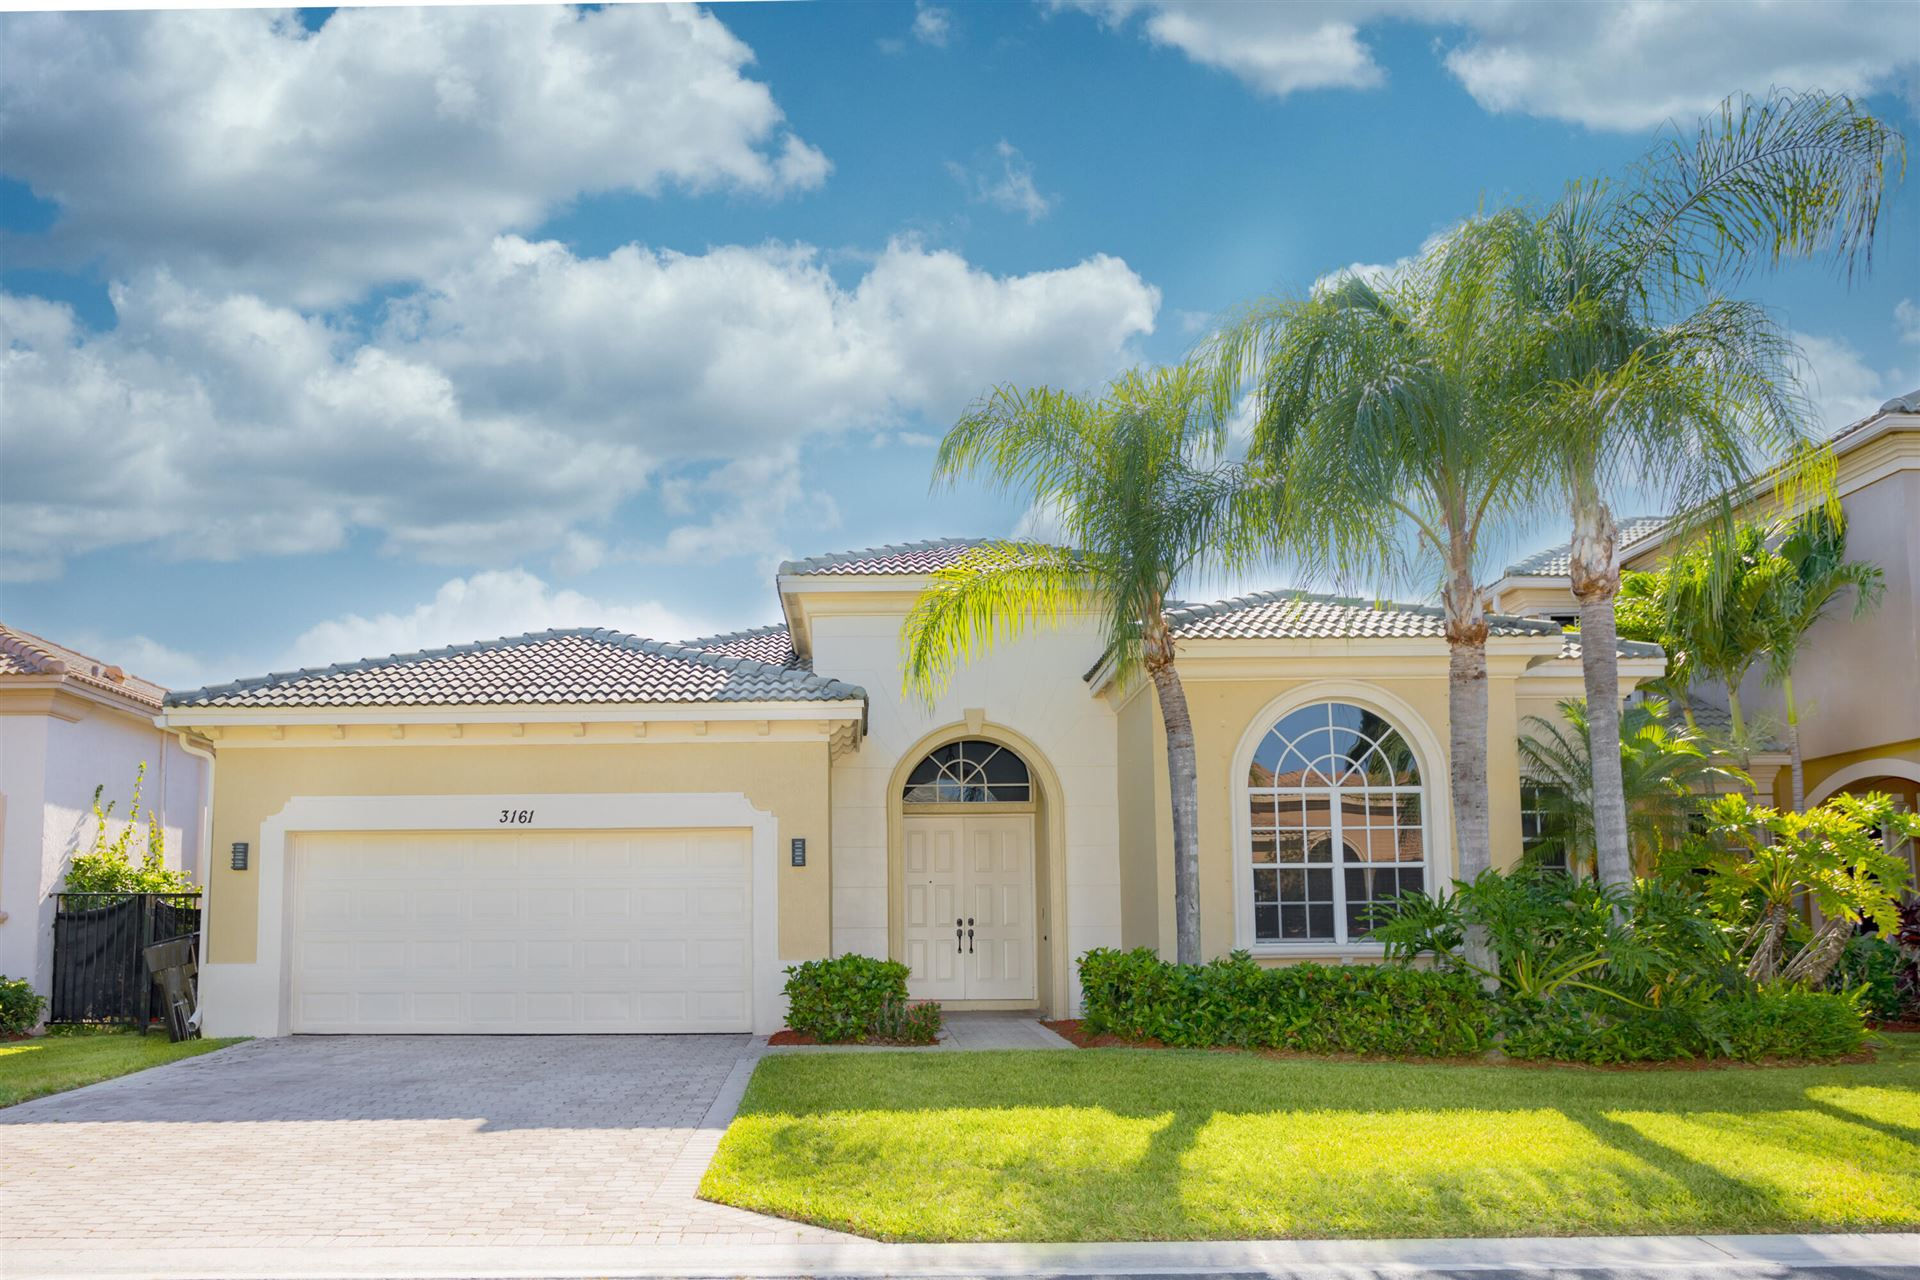 3161 Santa Margarita Road, West Palm Beach, FL 33411 - MLS#: RX-10723019